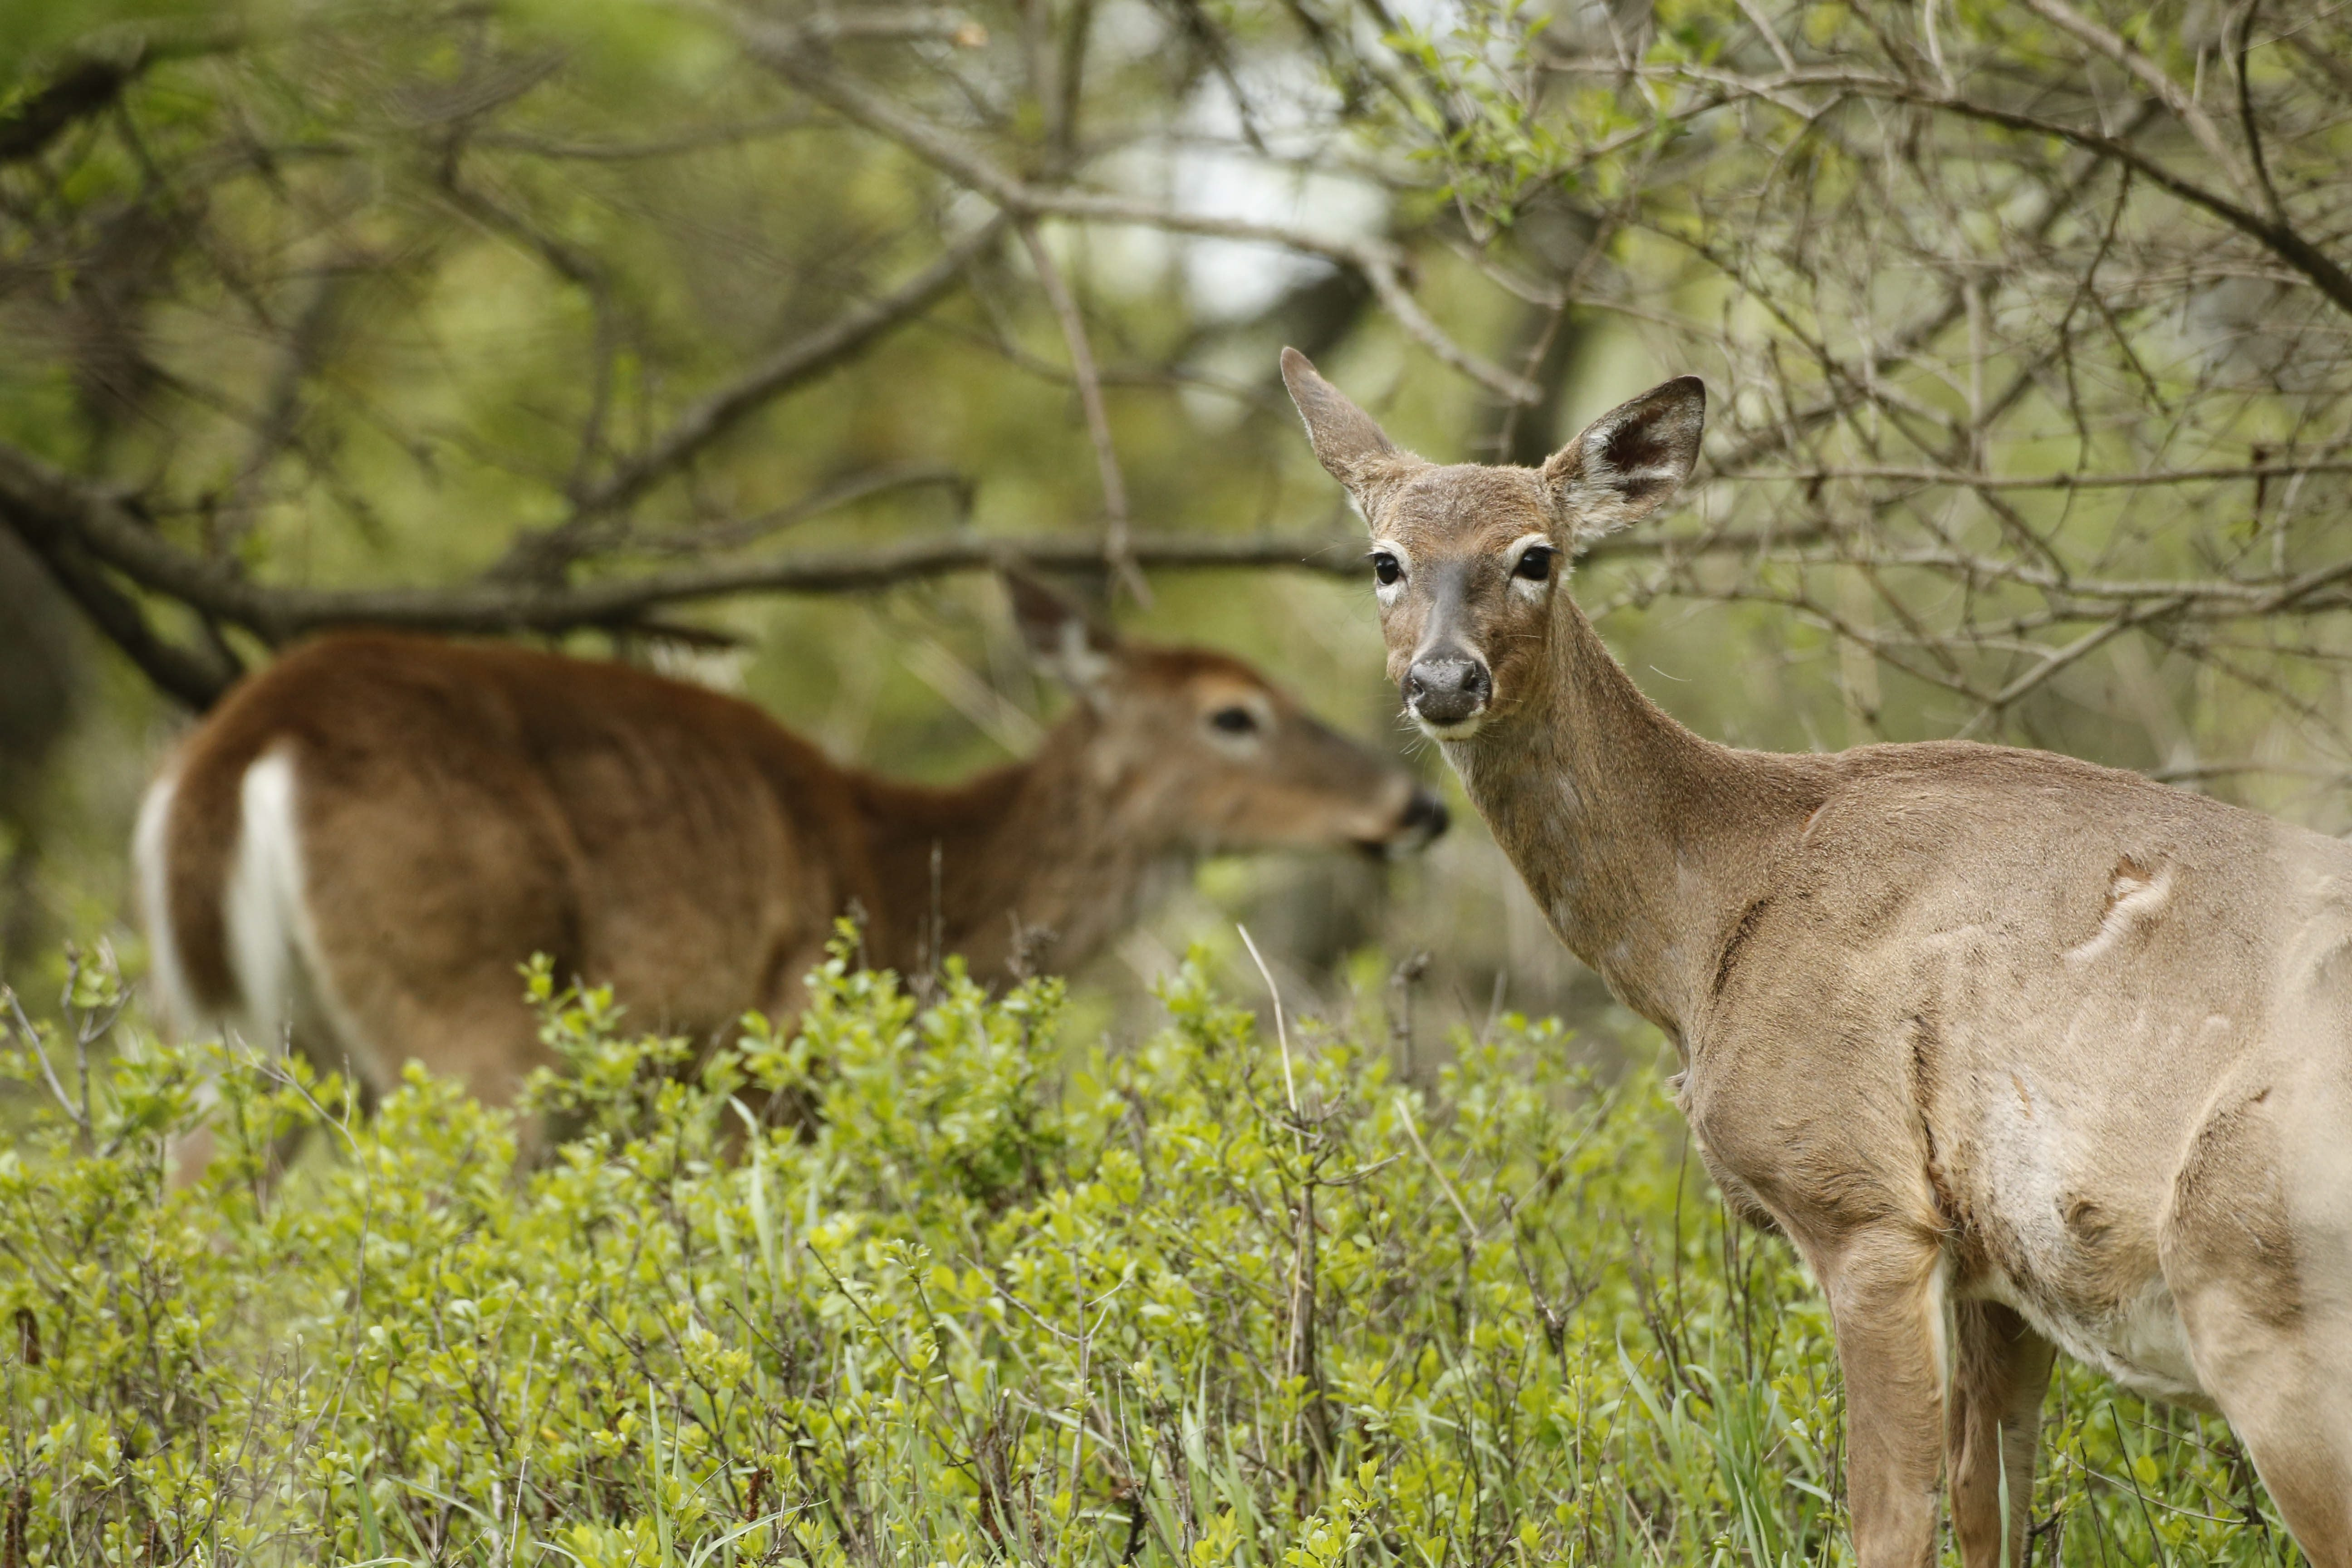 Whitetail deer forage at Tifft Nature Preserve, Wednesday, May 13, 2015.  (Derek Gee/Buffalo News)